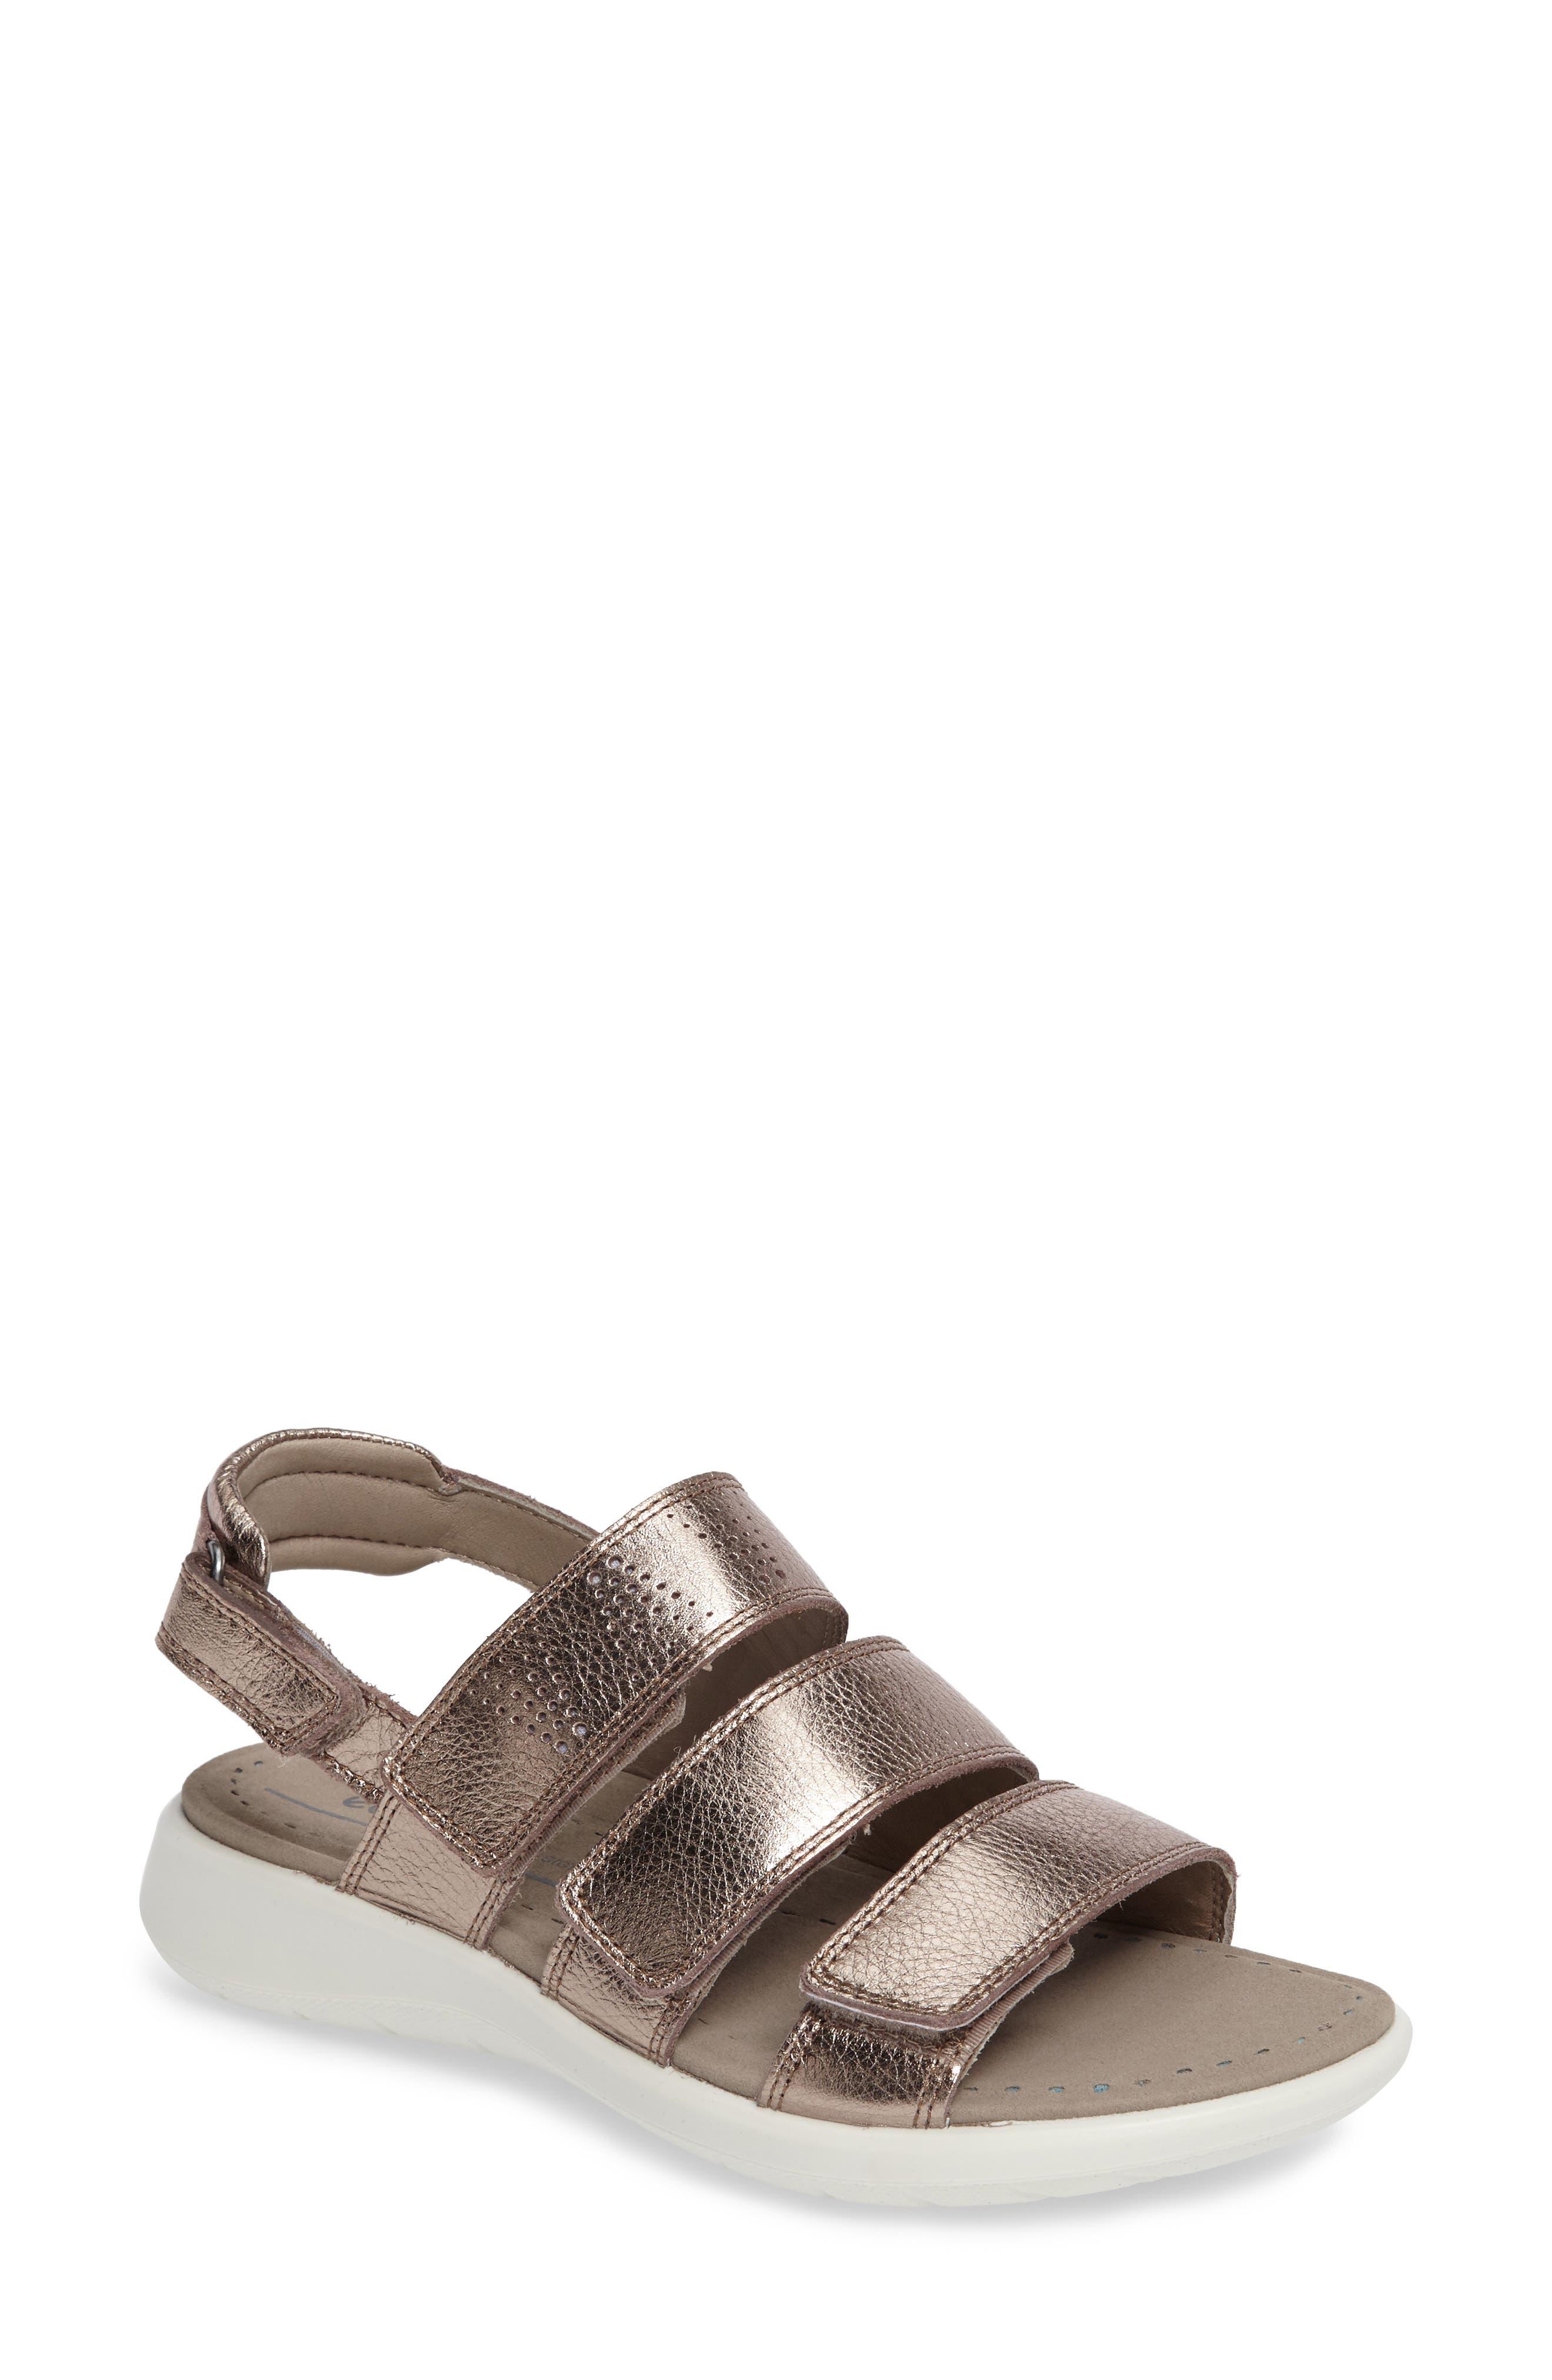 Main Image - ECCO Soft 5 Sandal (Women)